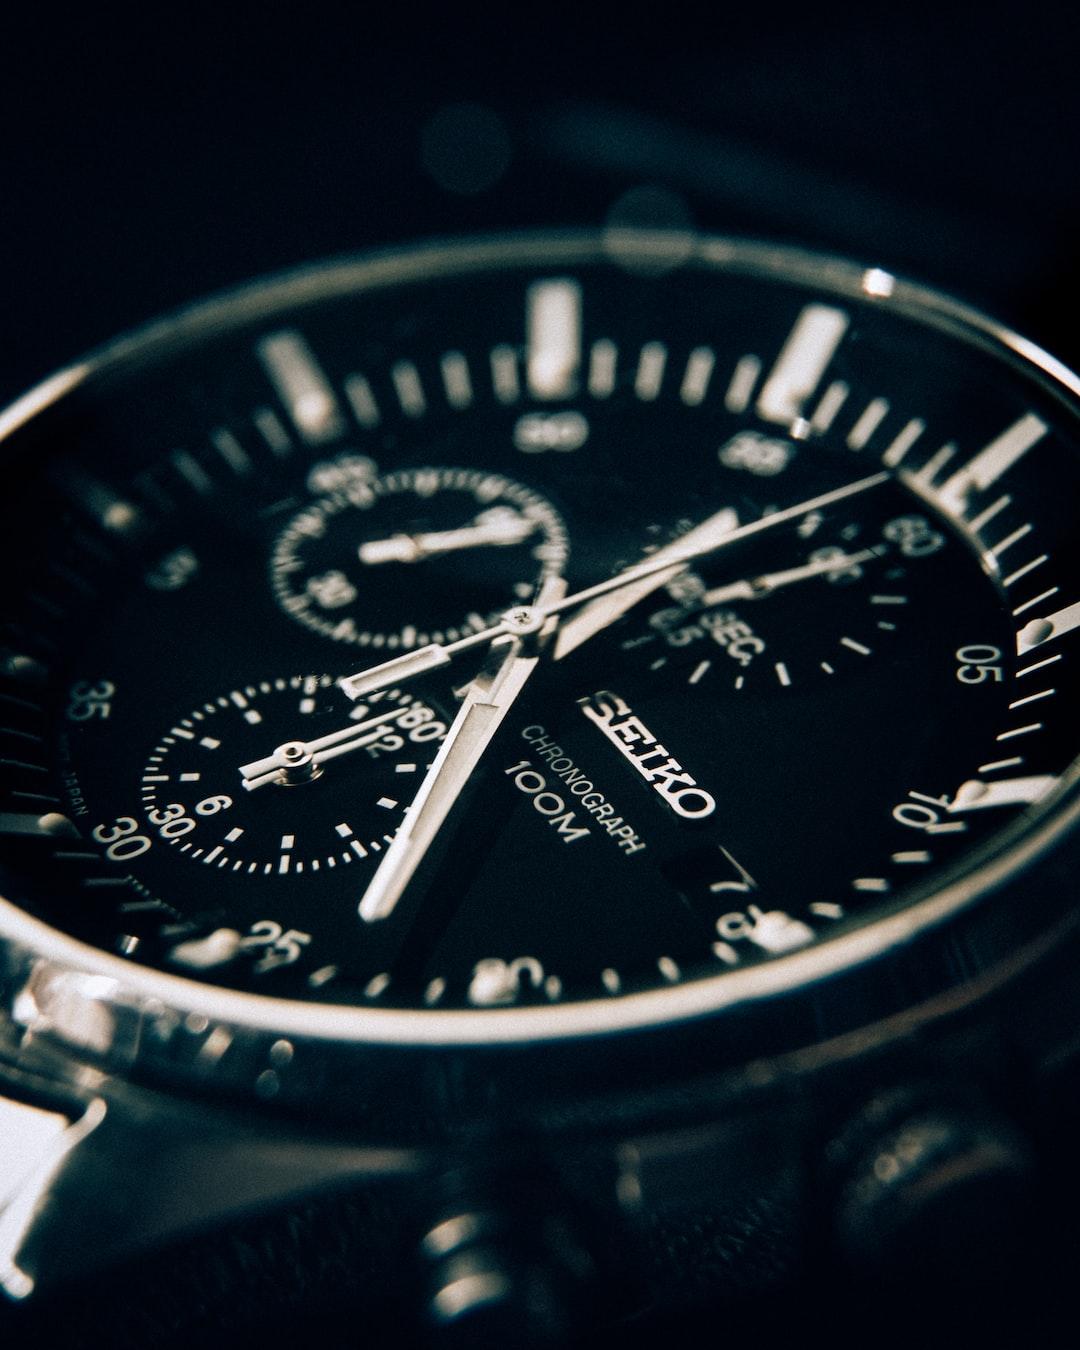 Seiko watch 100m chronograph. Time. Waterproof. Macro.